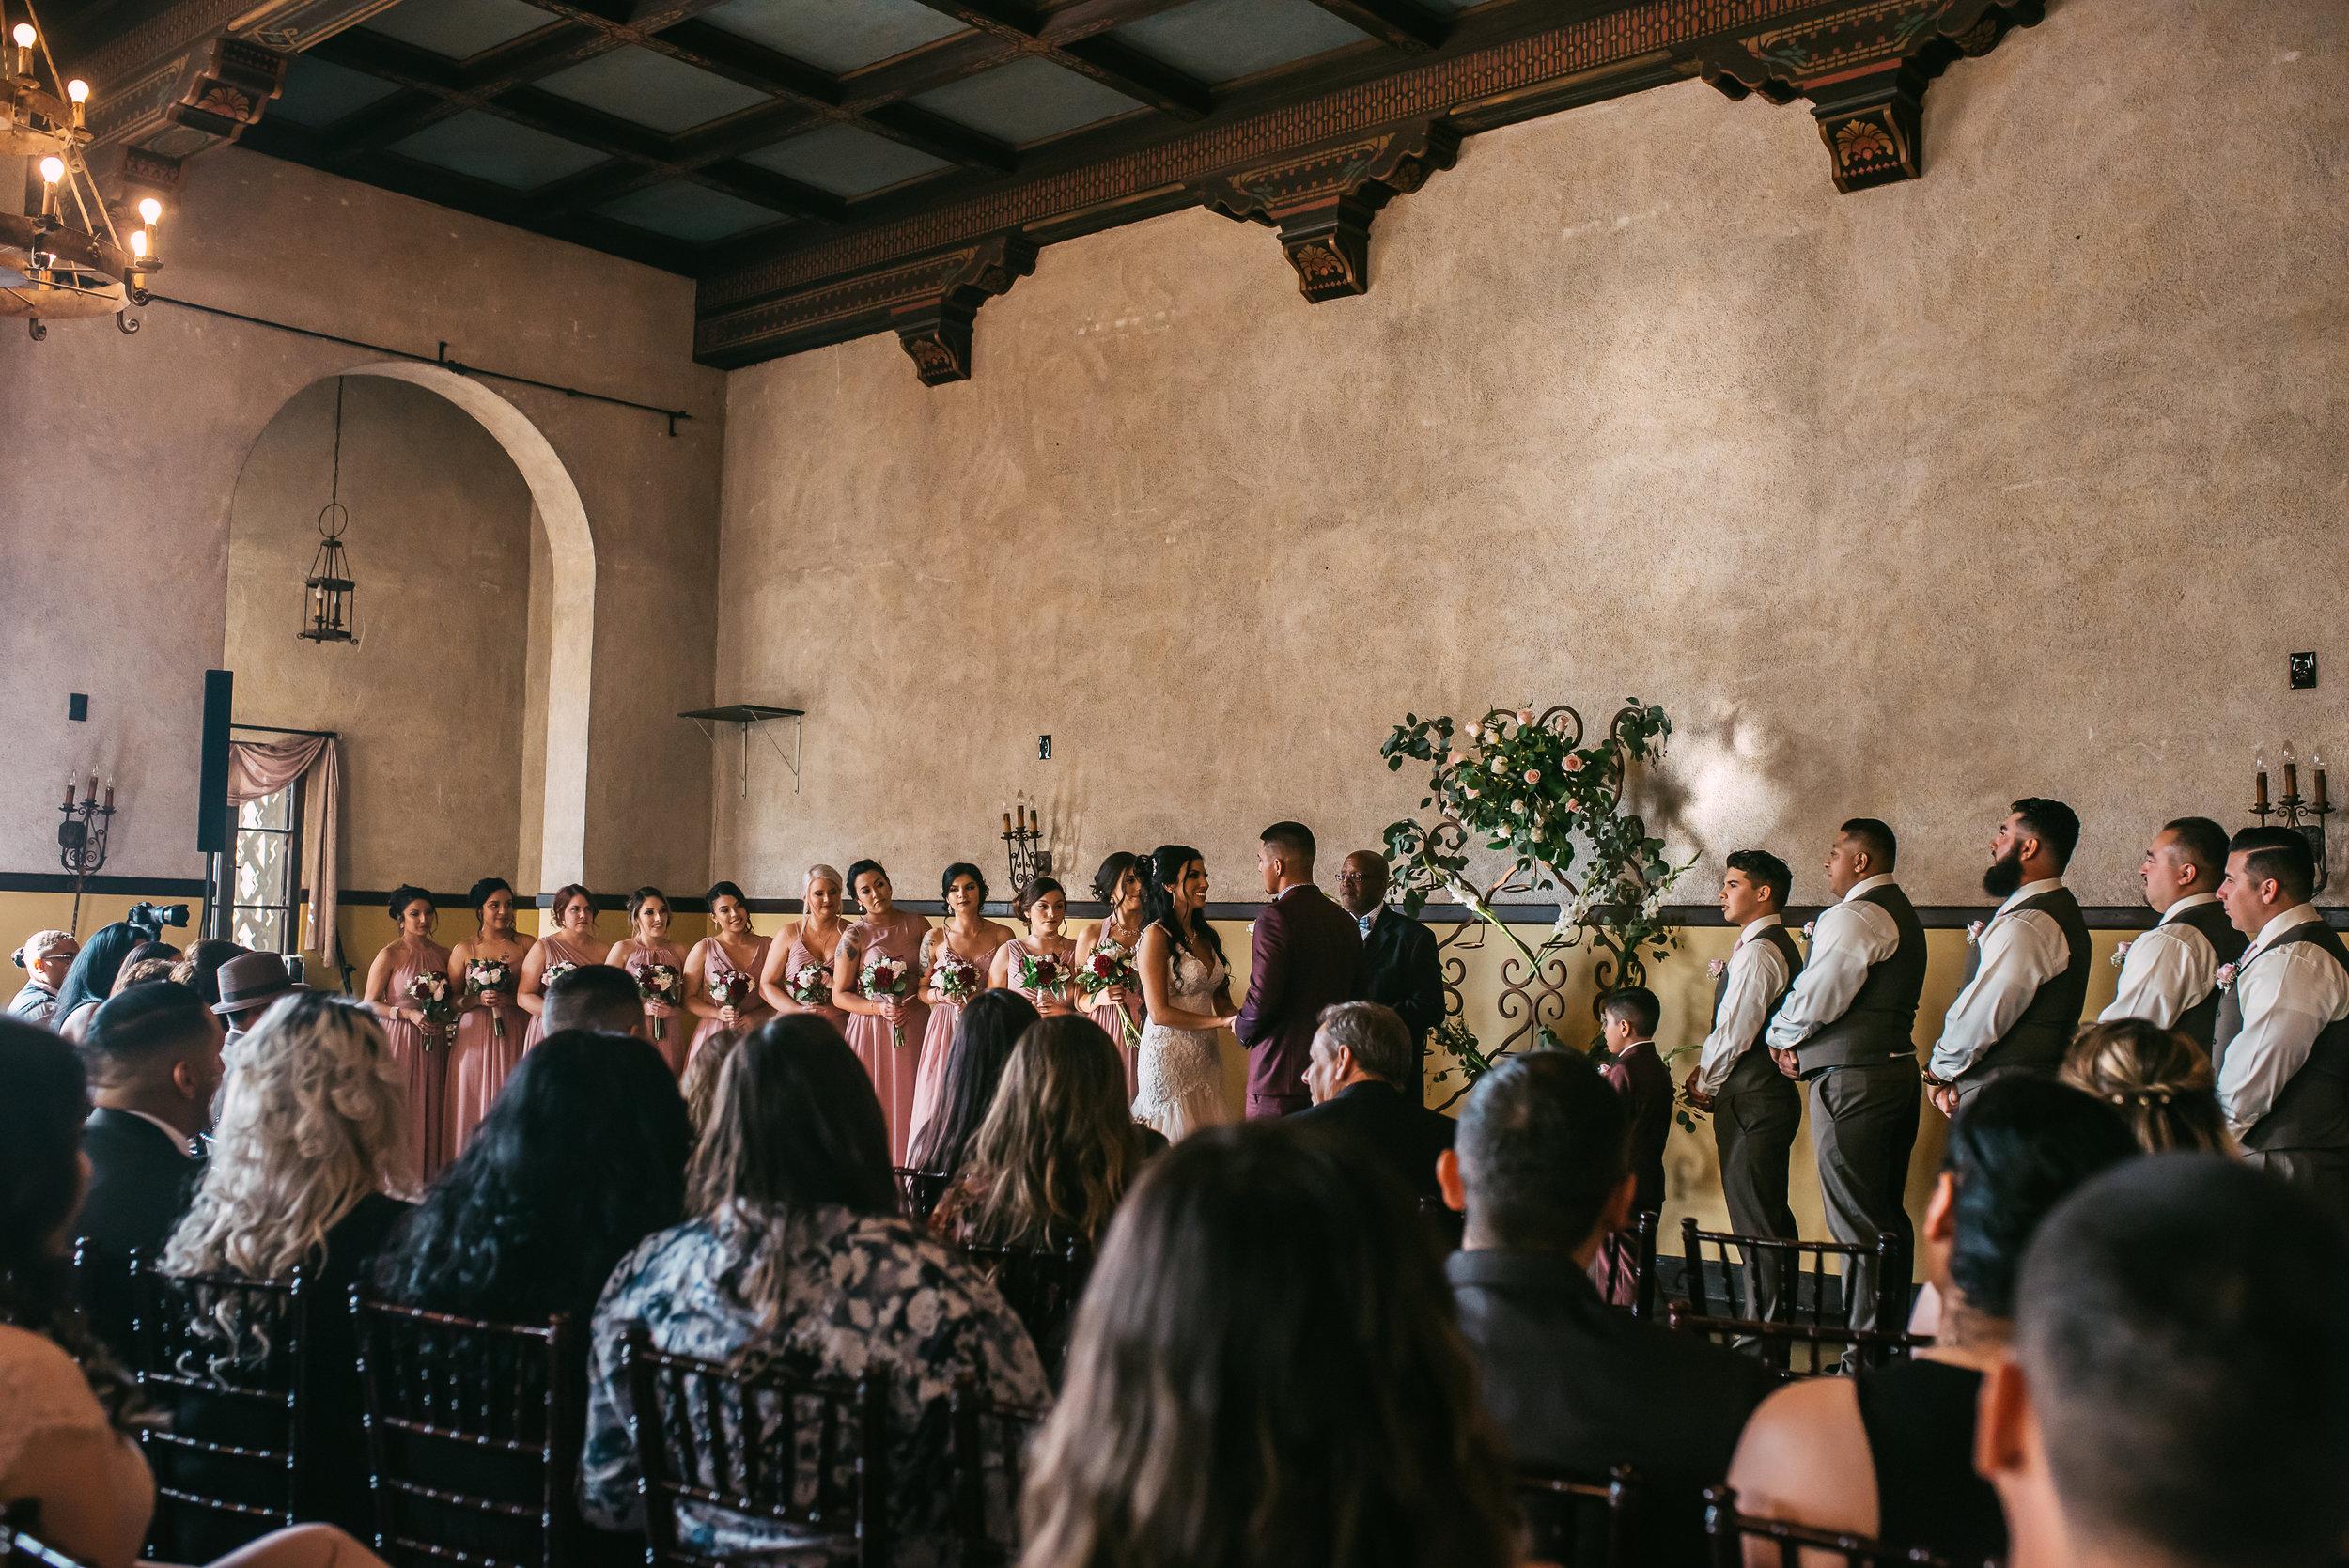 loft-84-riverside-maura-wedding-ceremony-37.jpg